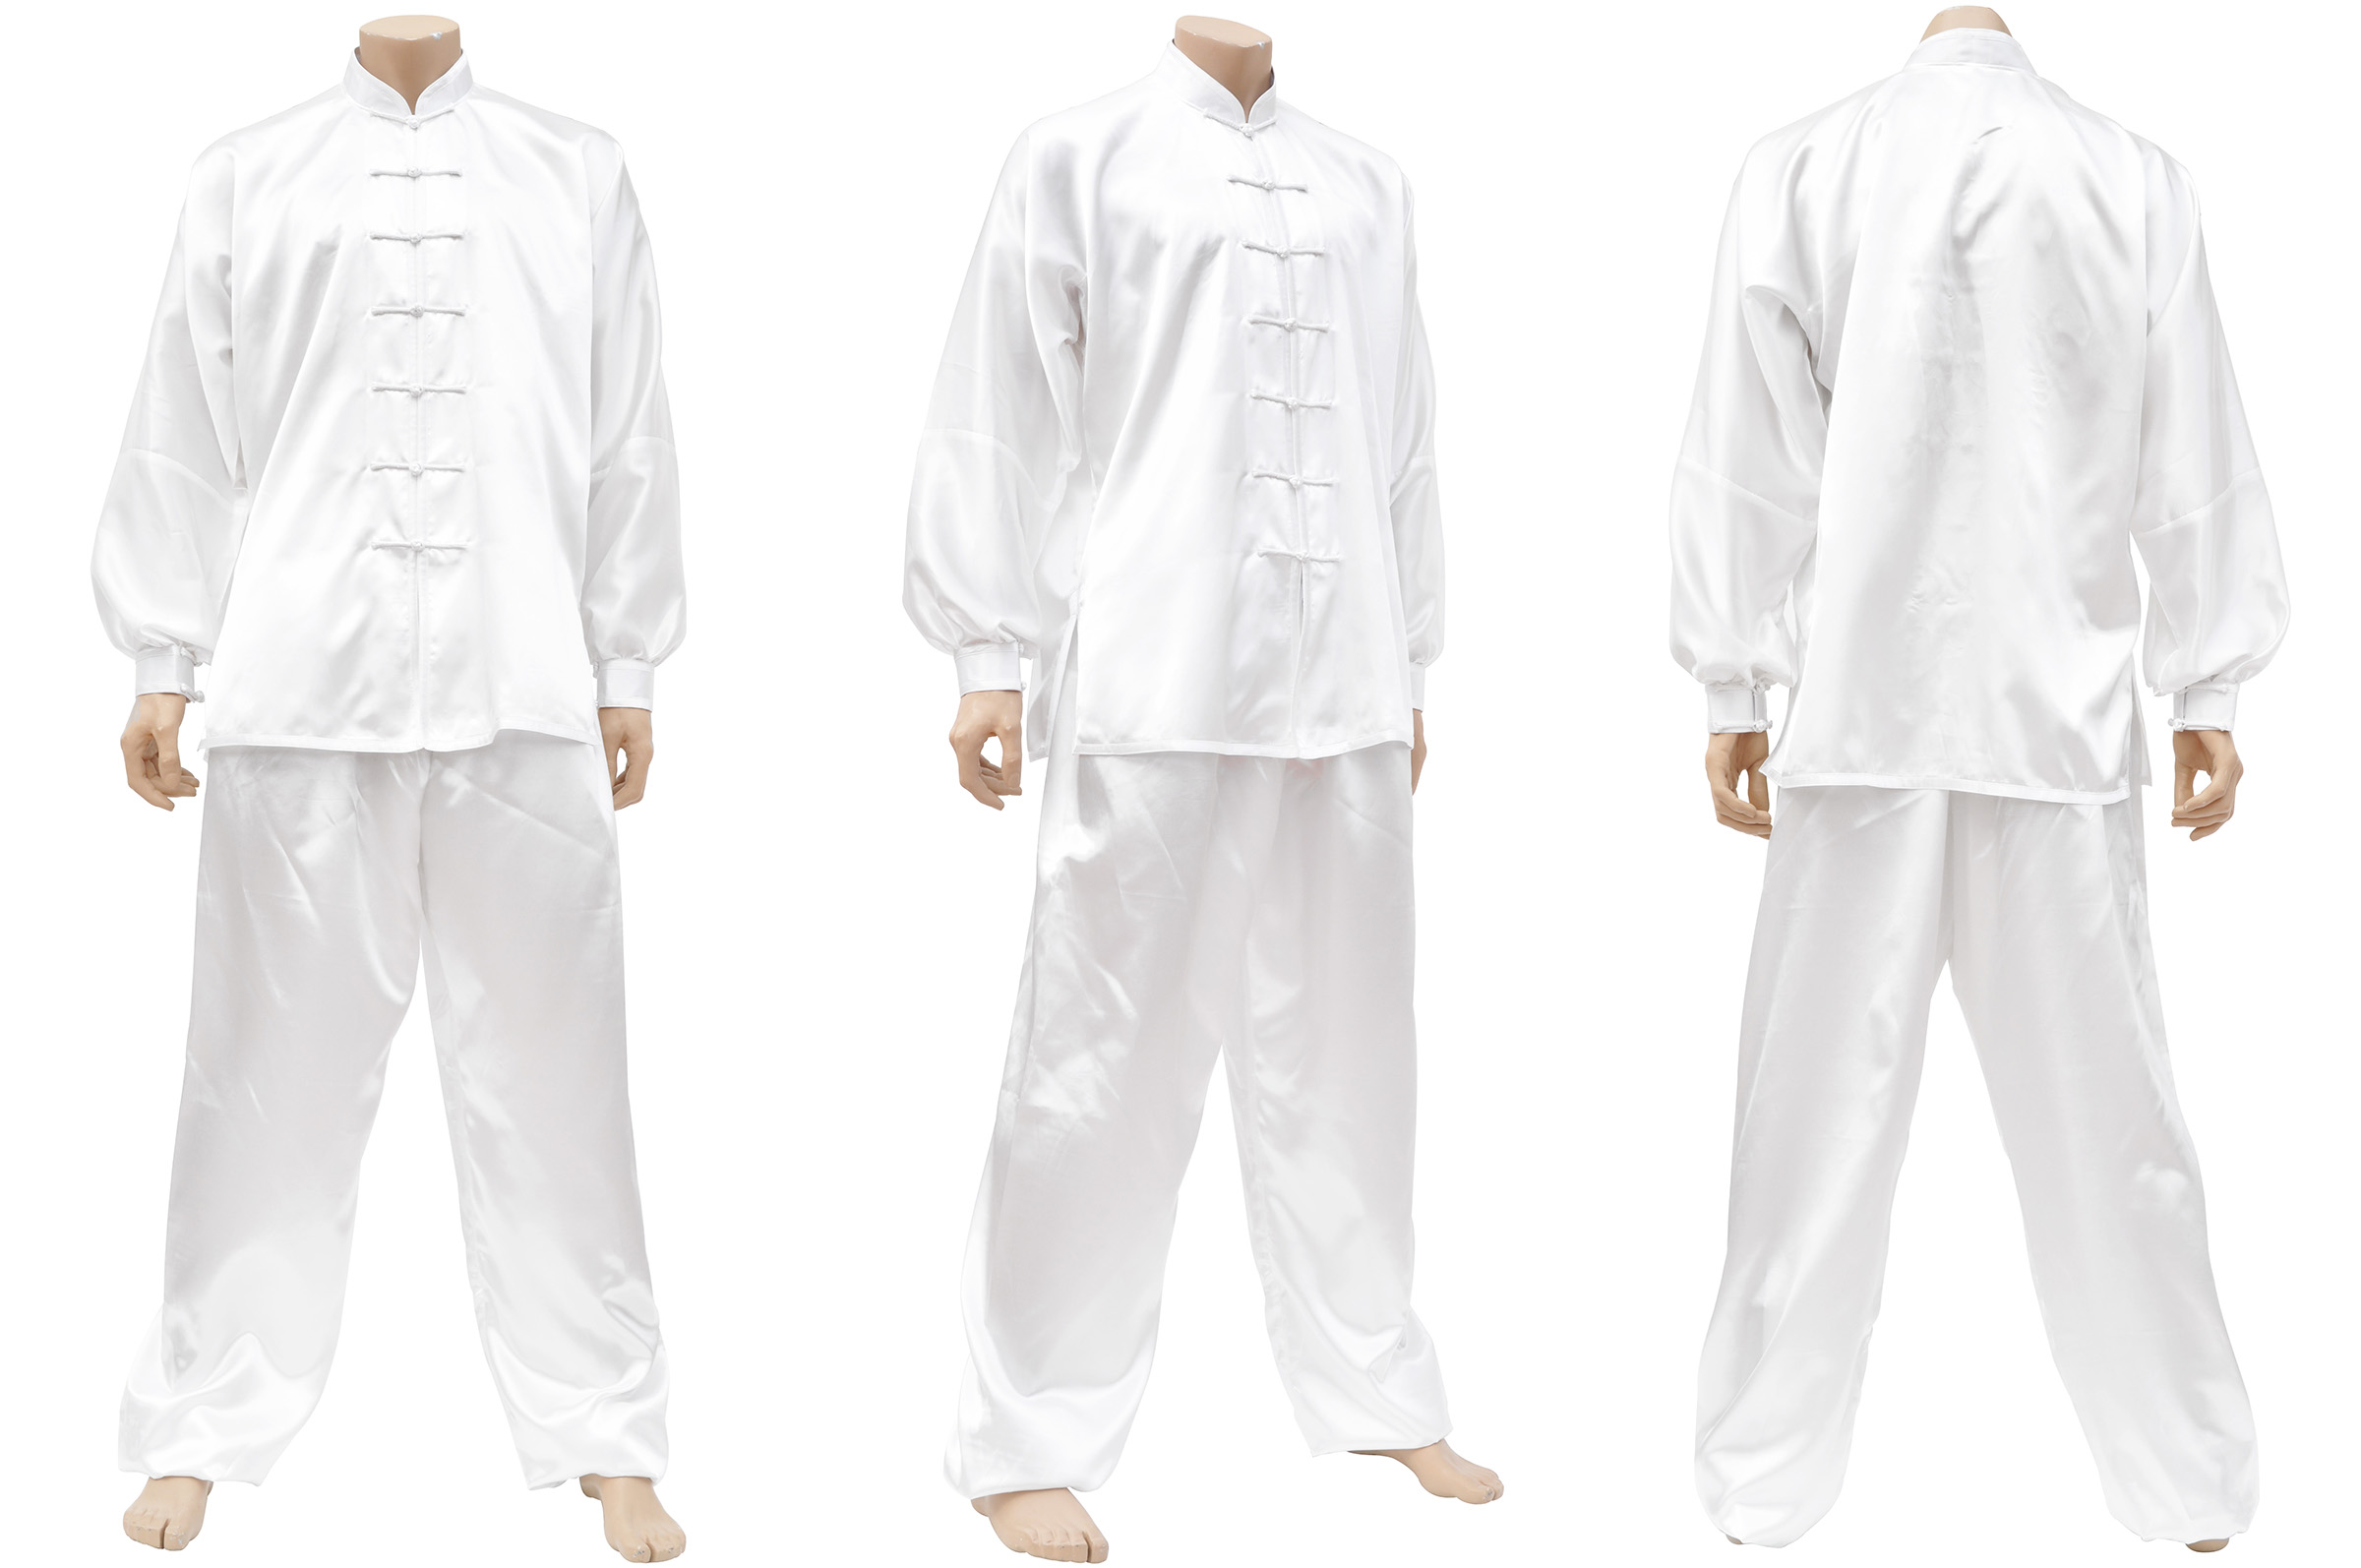 Tenue, Taiji Classique, Imitation Soie, Blanc